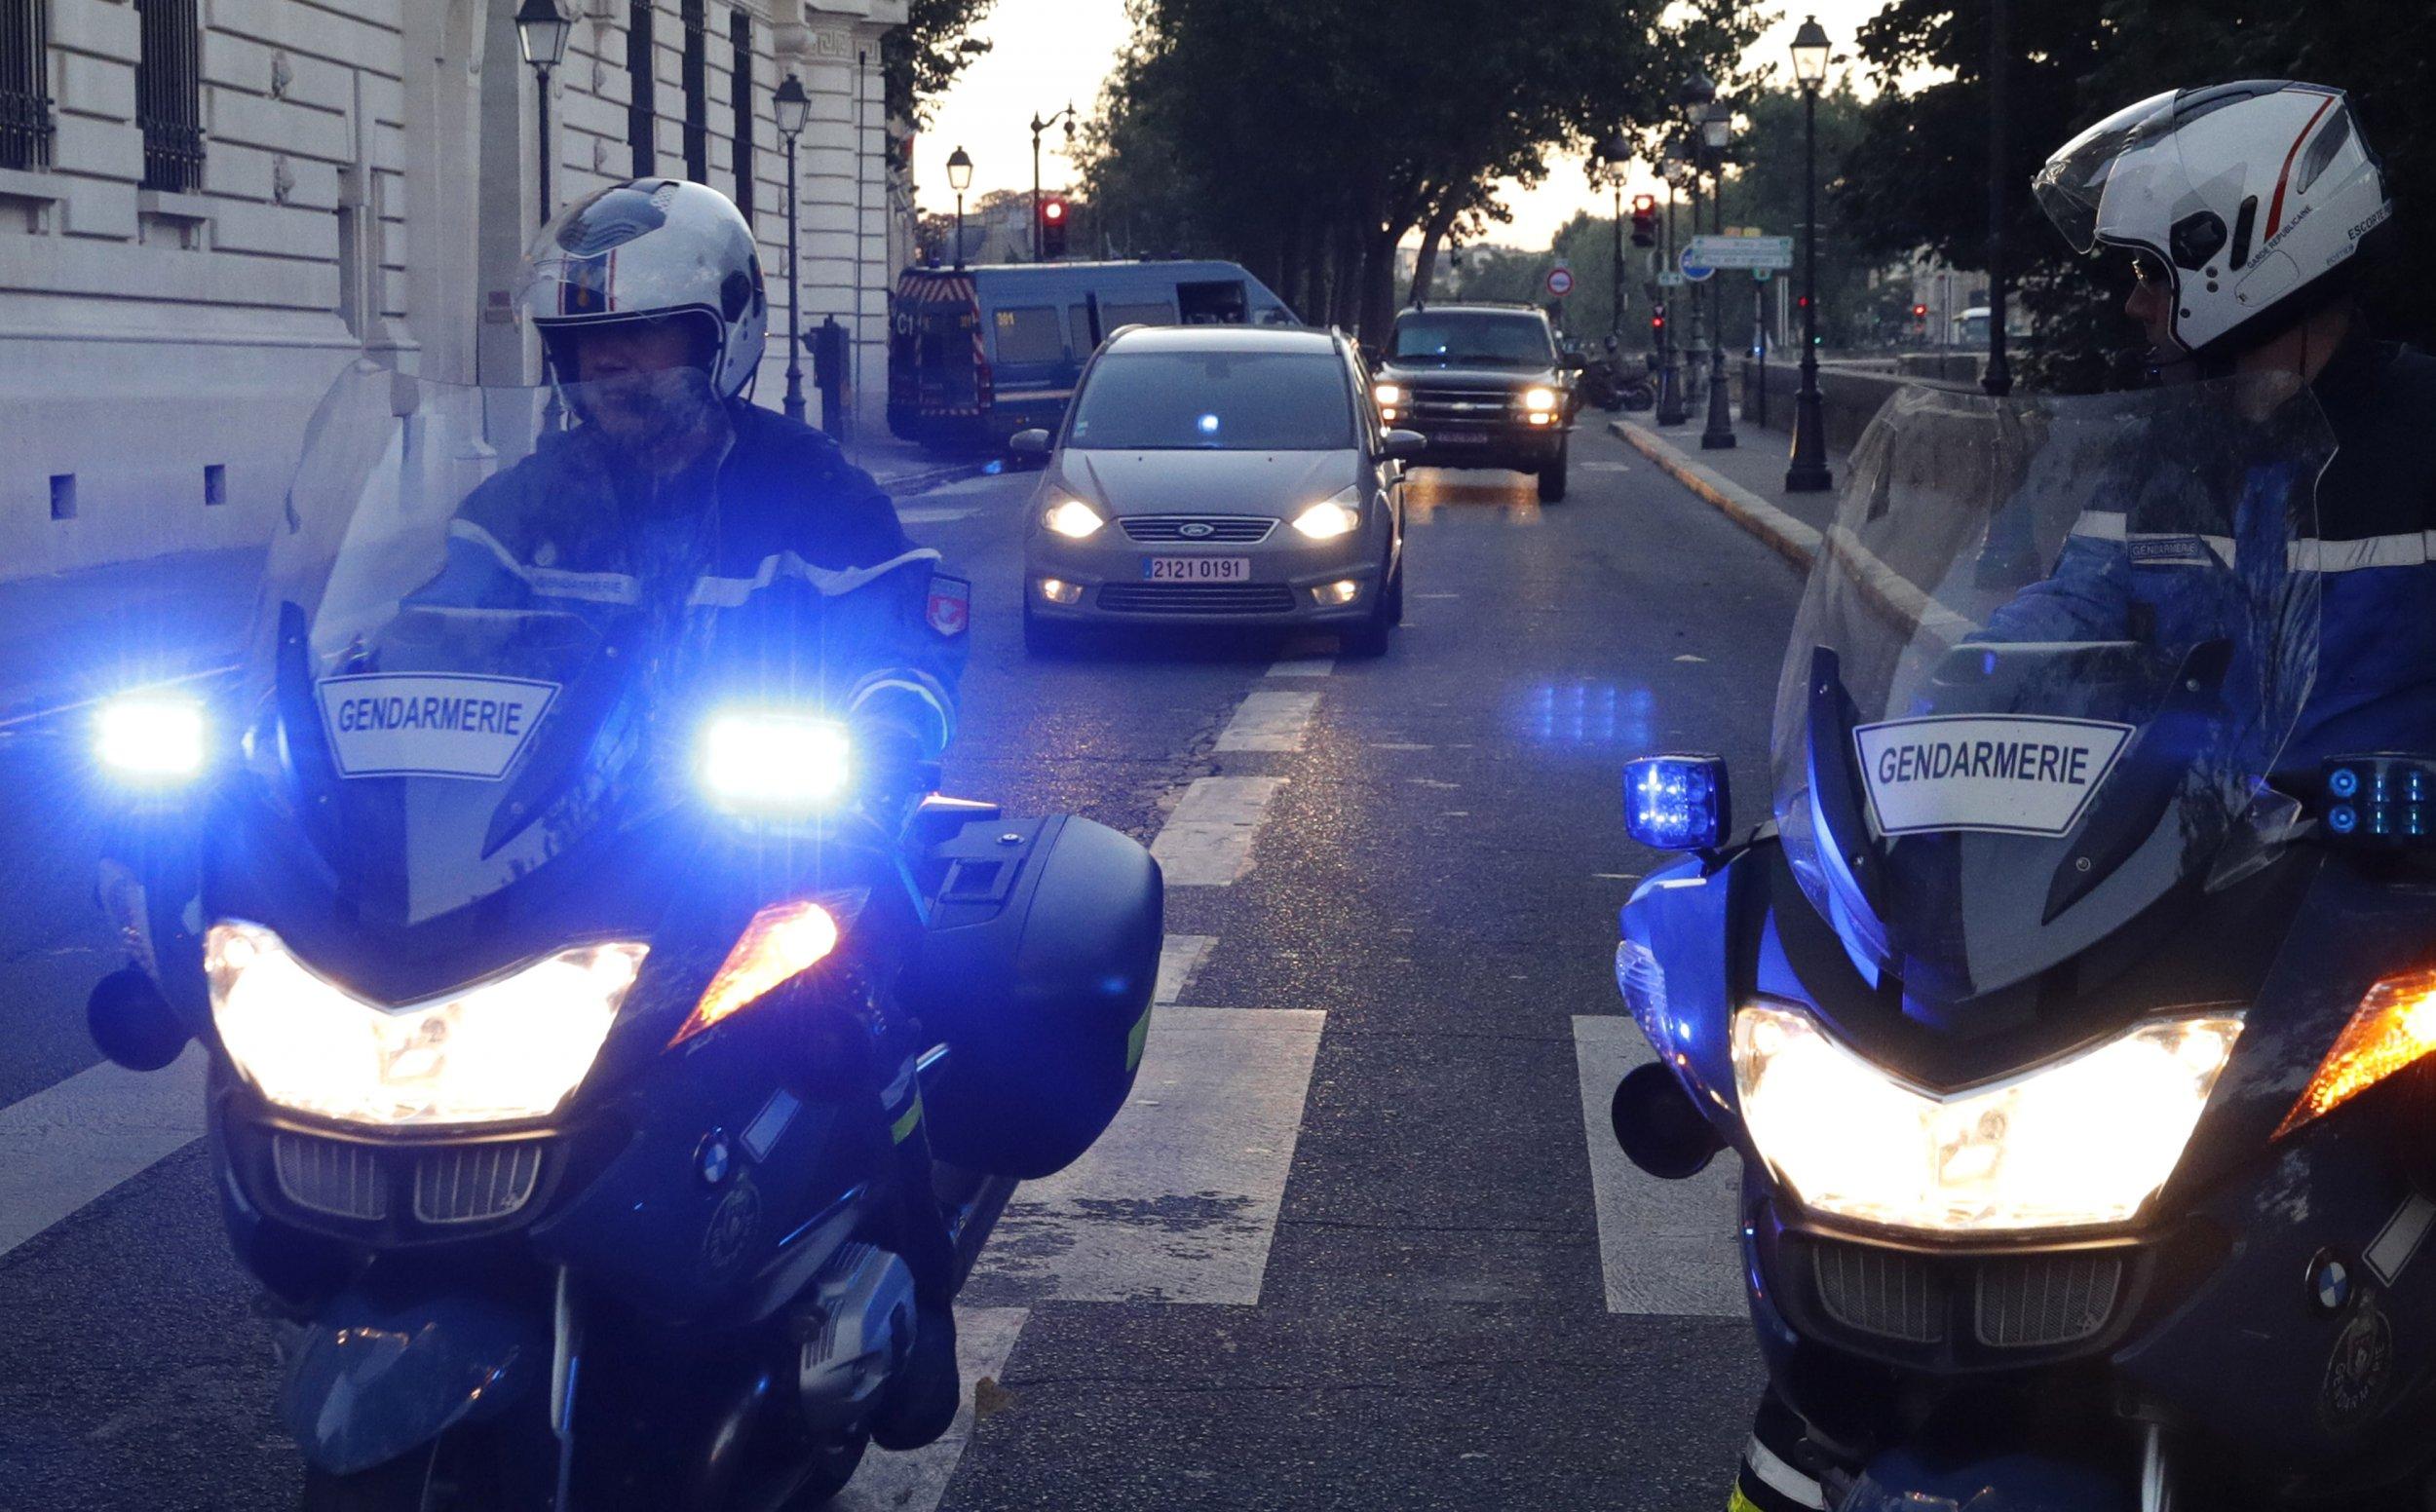 Police transporting Salah Abdeslam